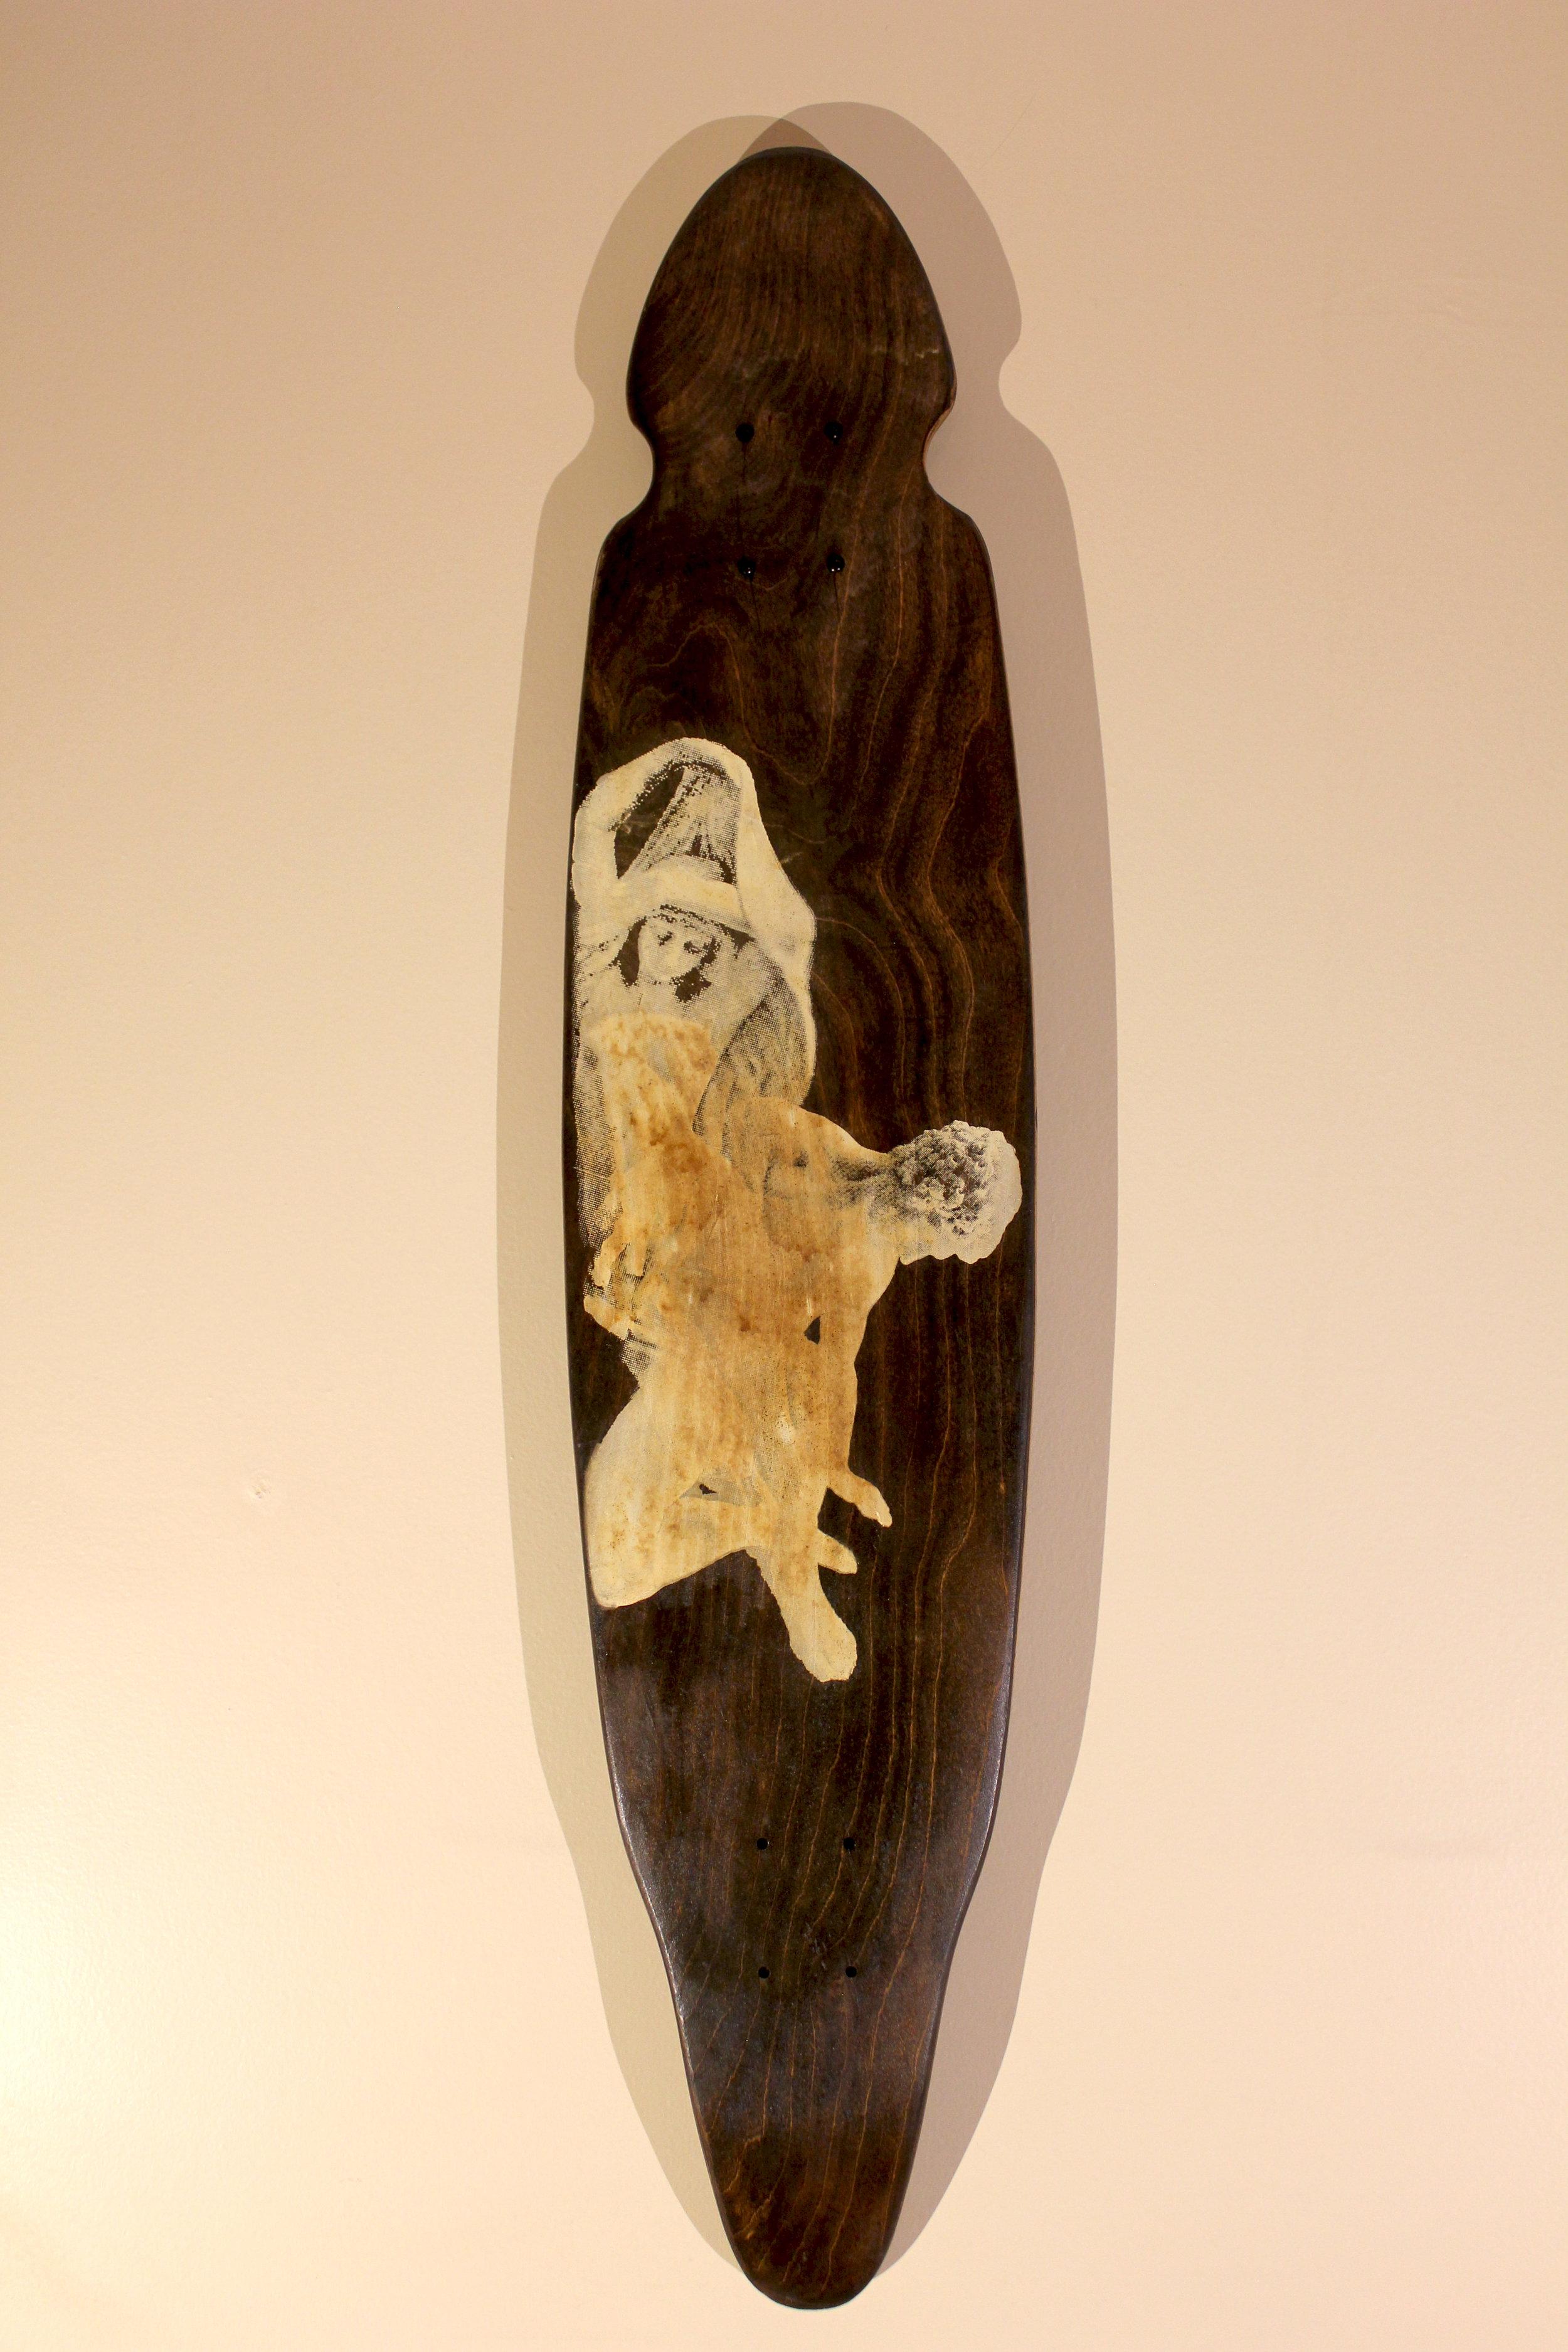 Marble   $300 longboard, acrylic ink, woodstain, wood seal